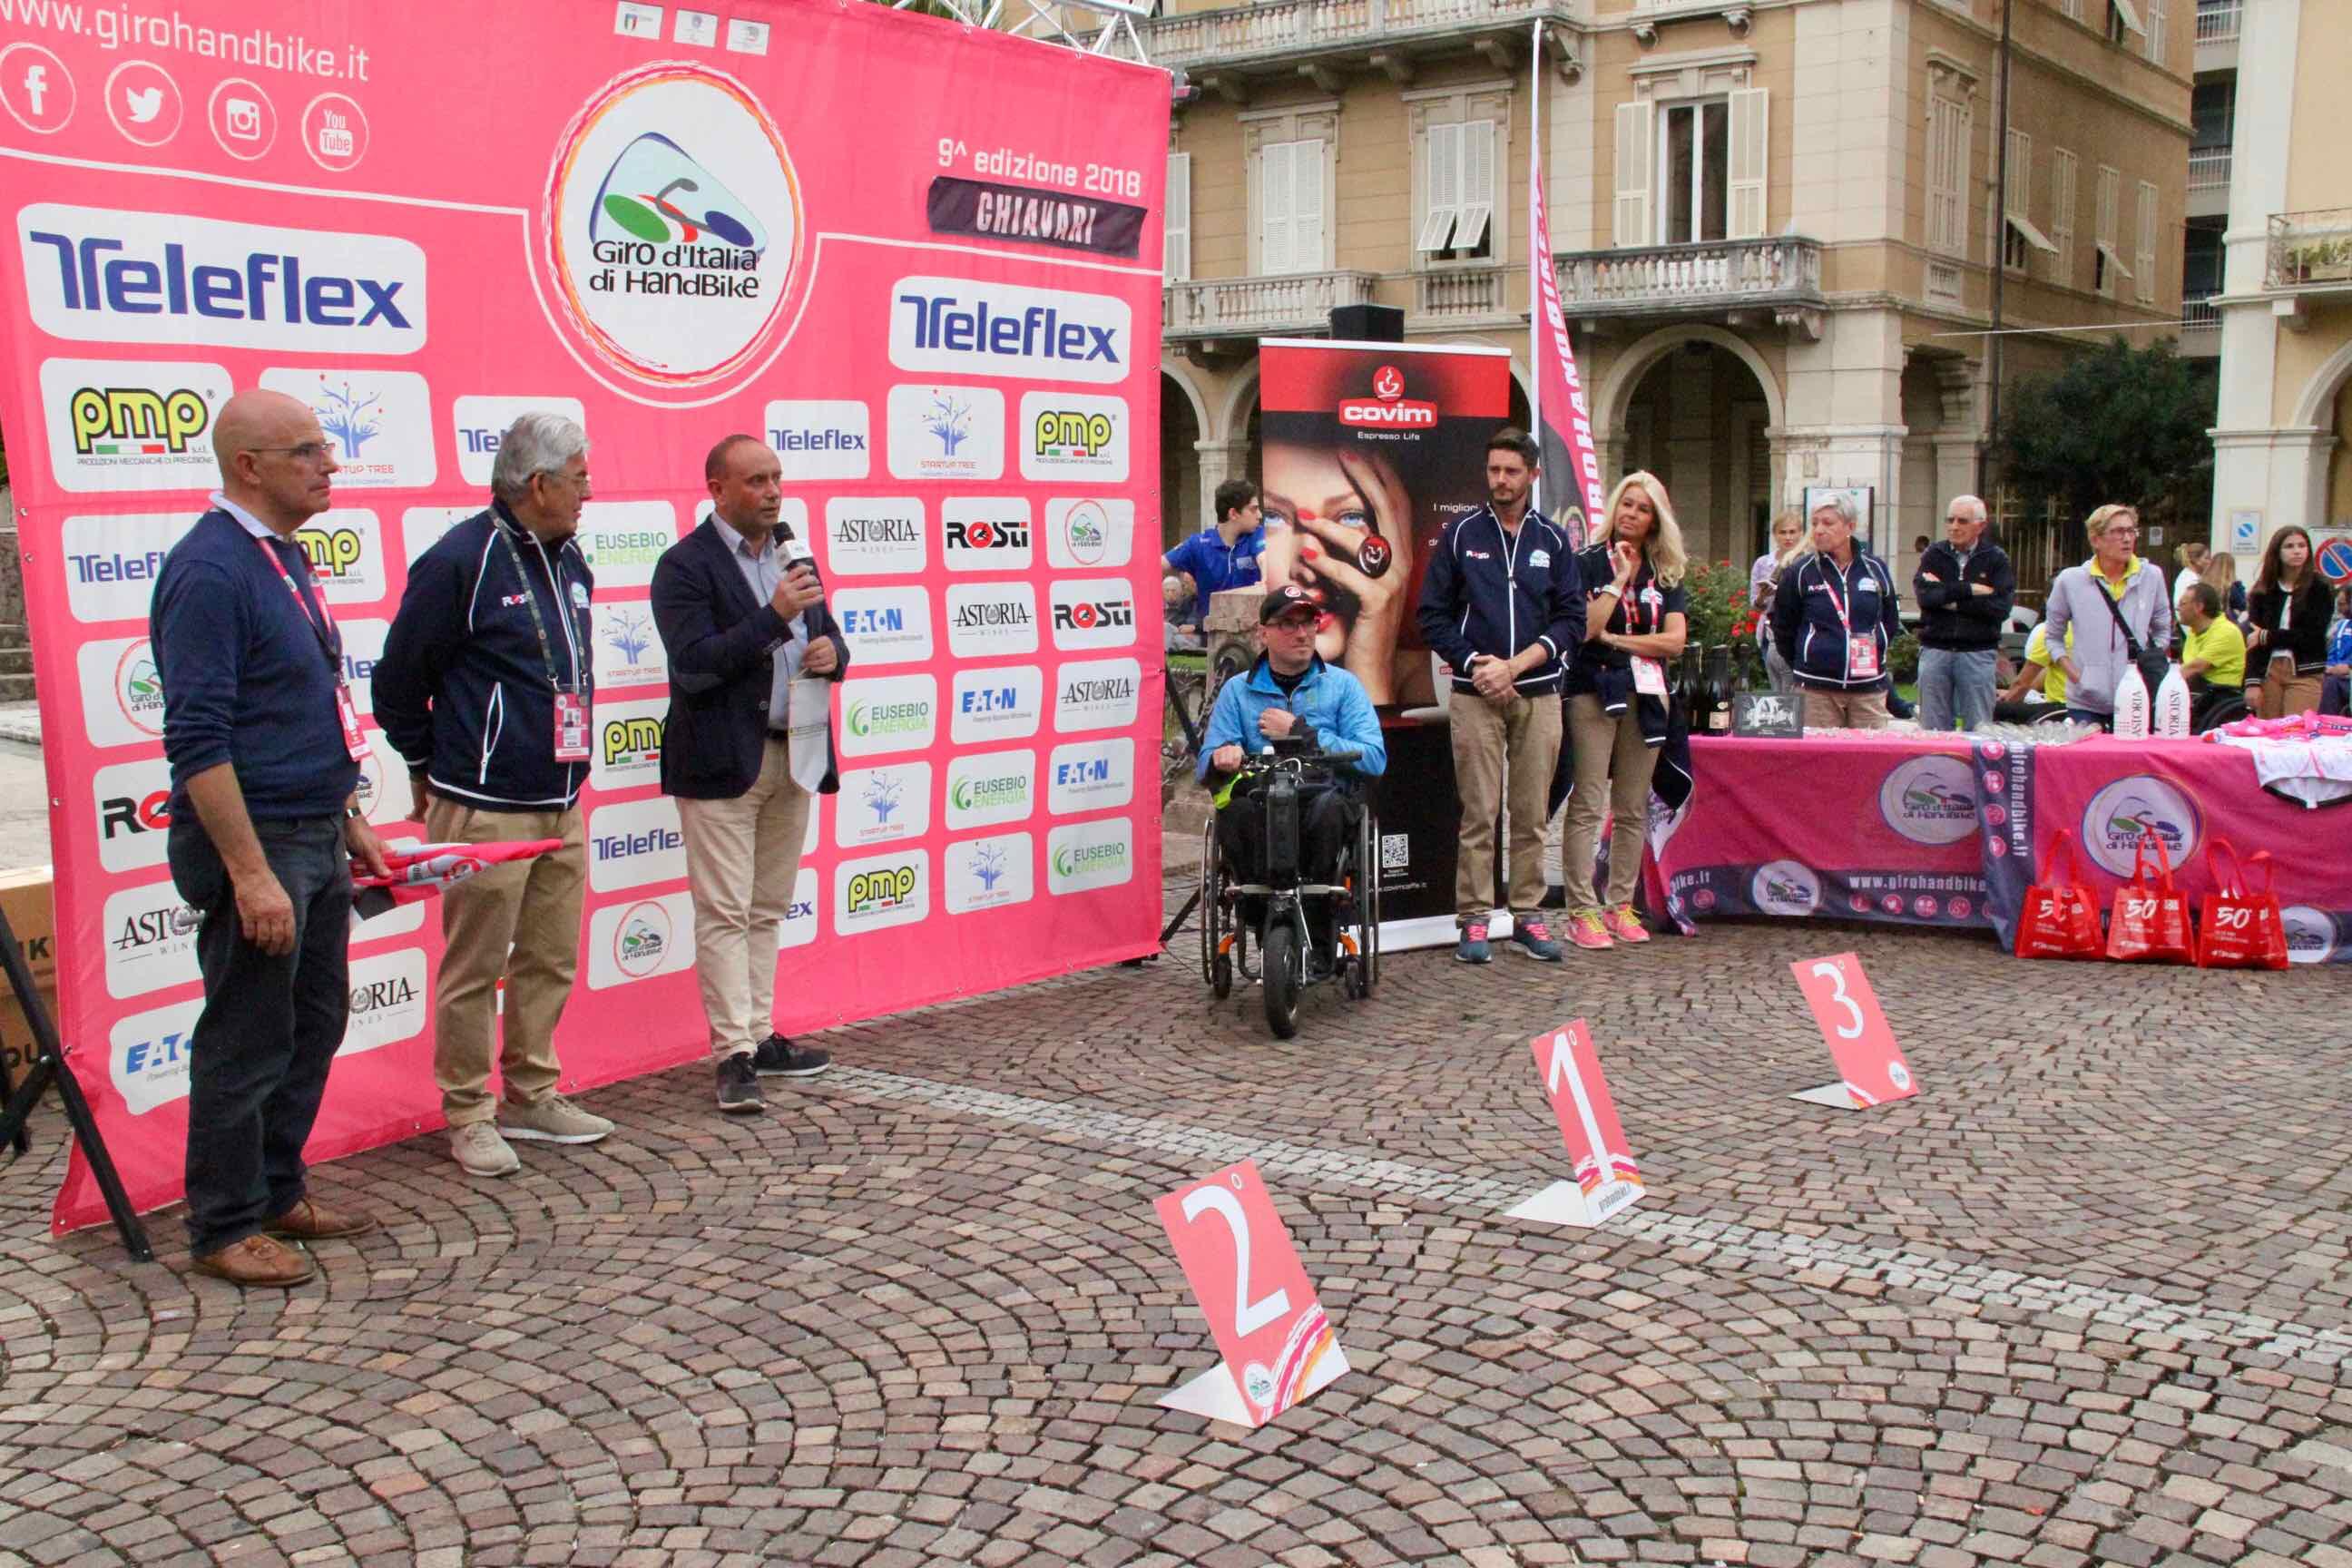 1° Memorial don Nando Negri a Chiavari per il Giro d'Italia Handbike 2018 - 18